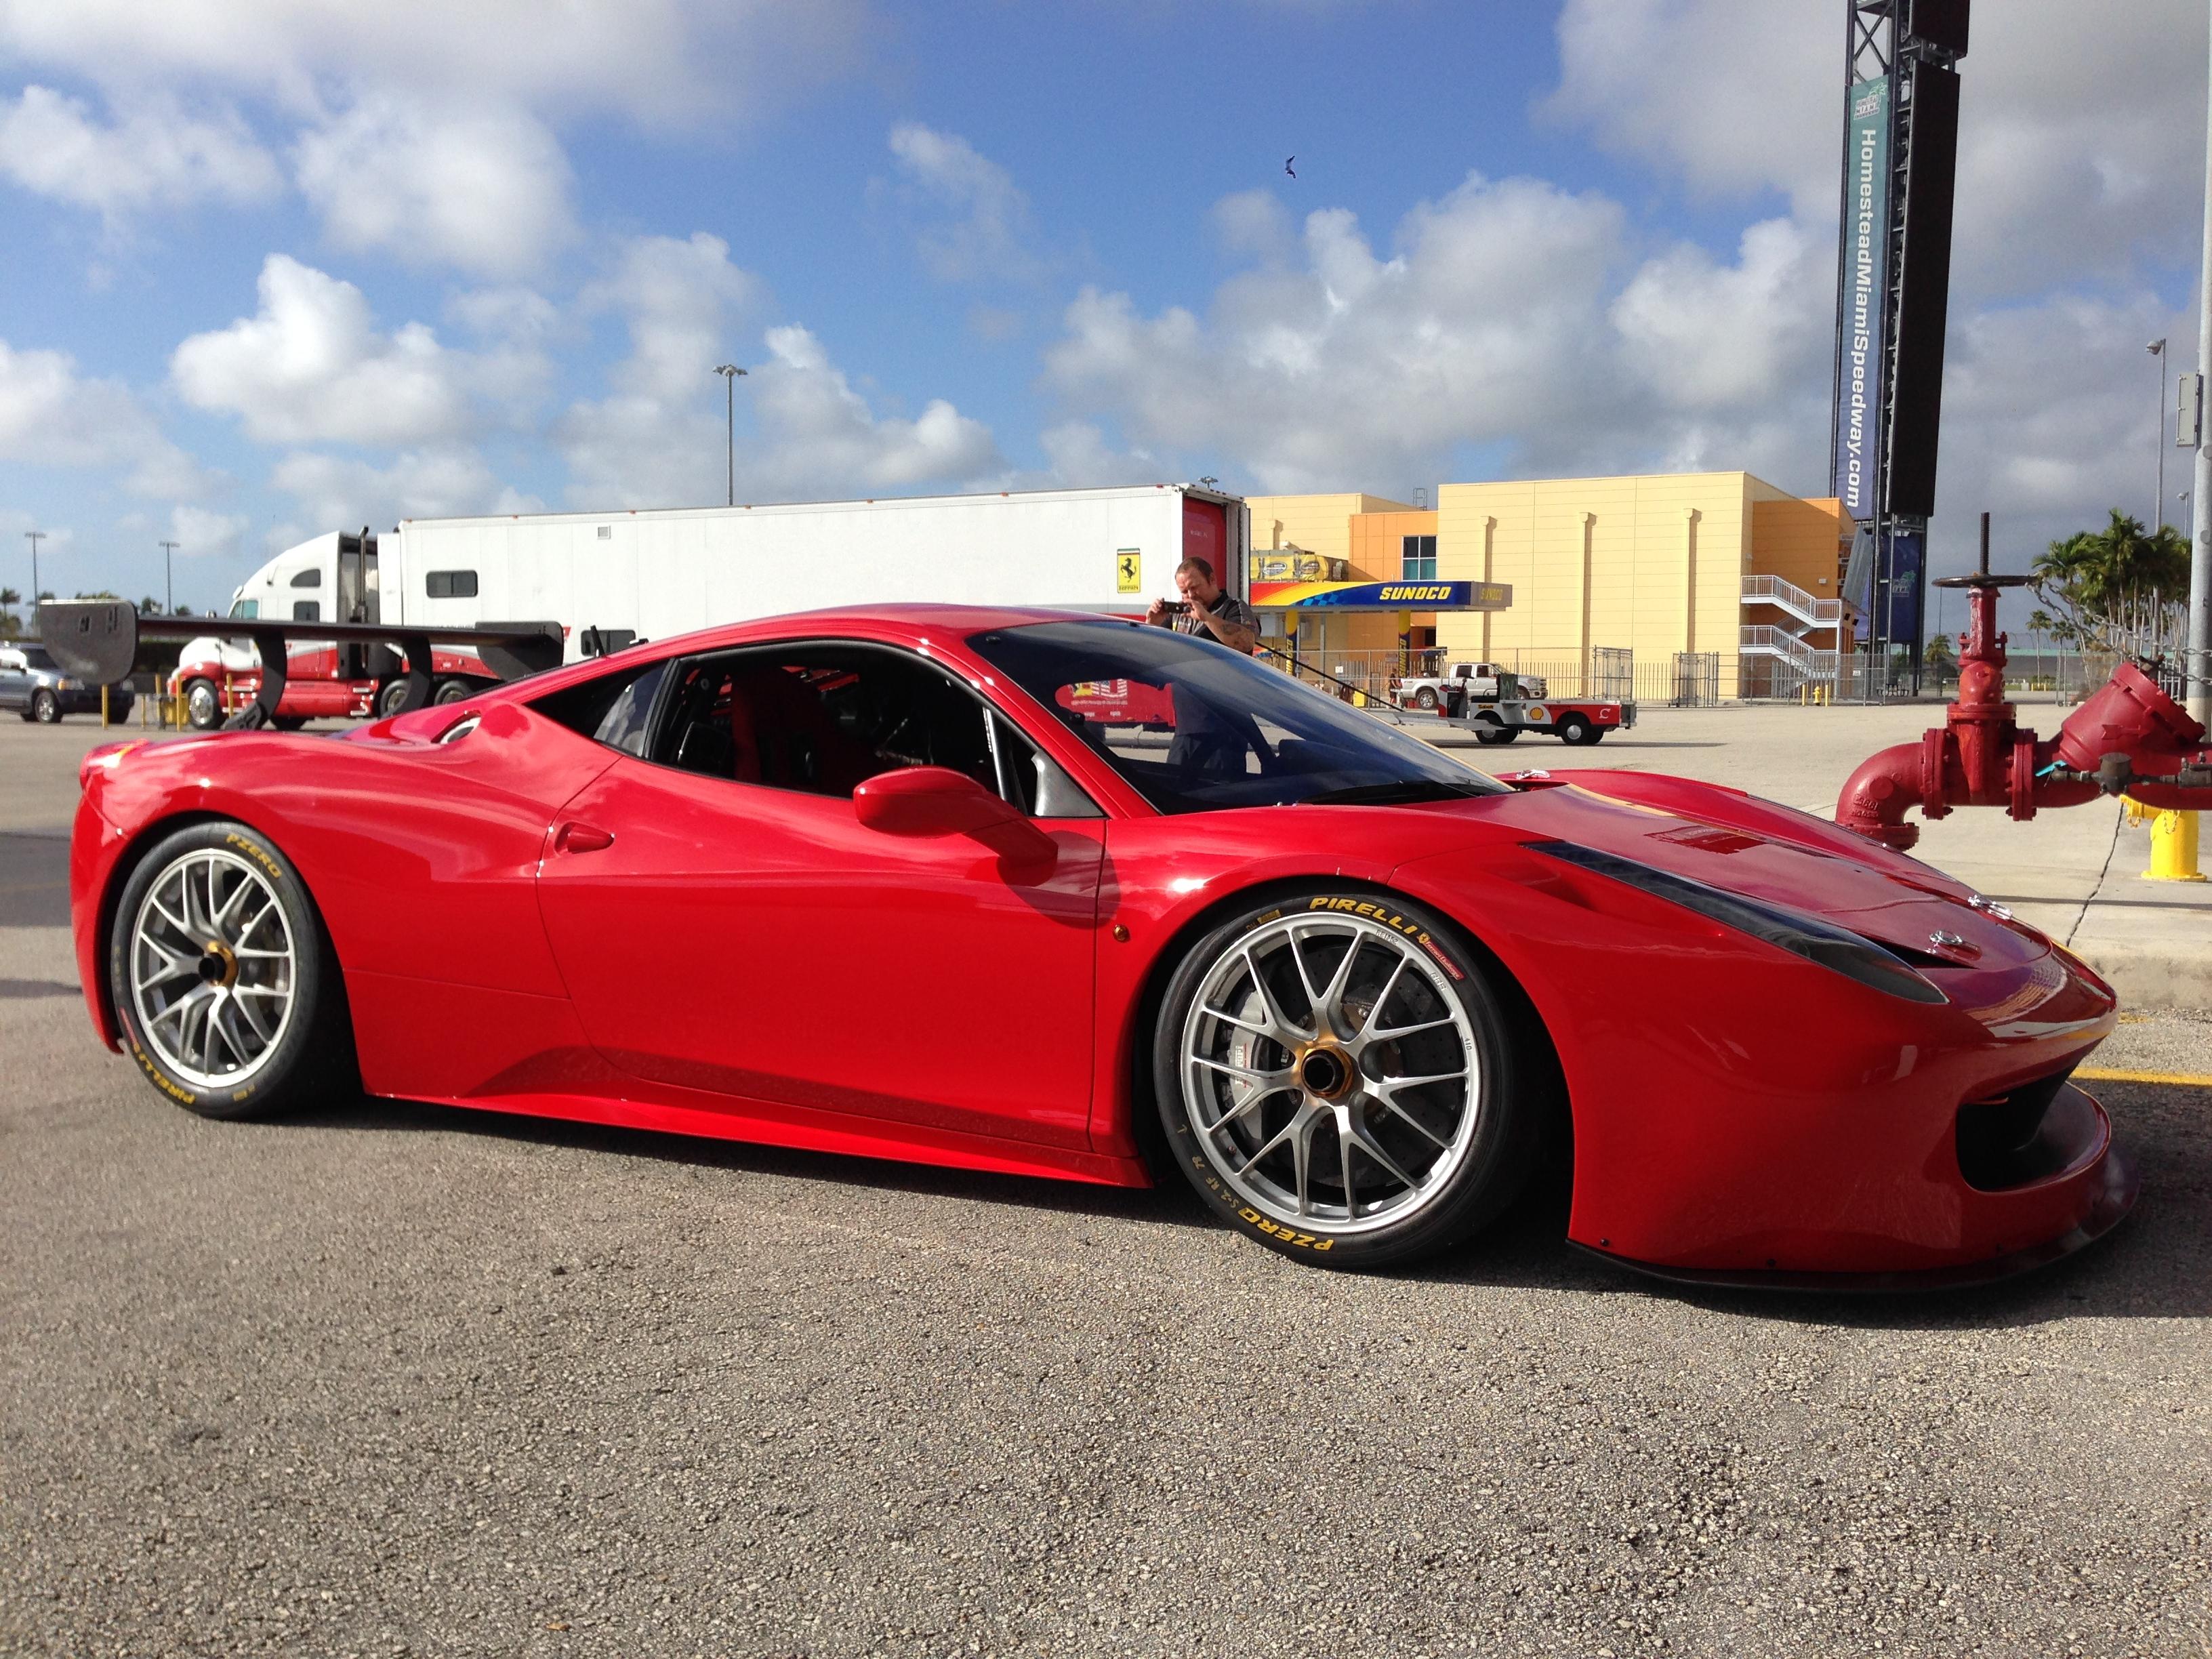 Driving The 2014 Ferrari 458 Challenge Evo Guy Cosmo Professional Racing Driver Driving Coach Entrepreneur Tv Show Host Imsa Sro Elms Wec Le Mans